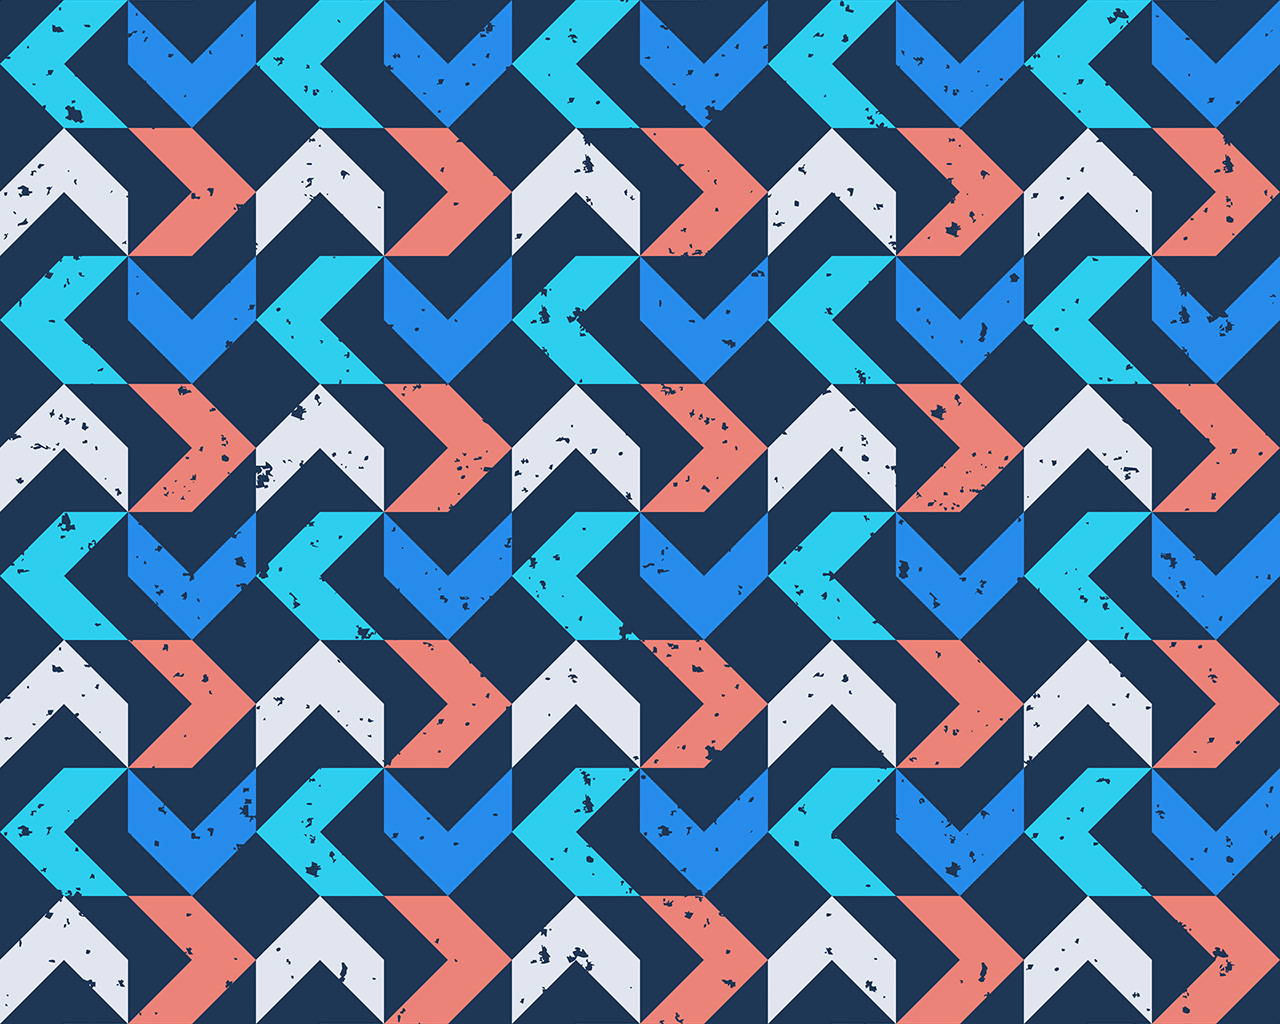 Snow Falling Wallpaper For Ipad Vo74 Retro Red Blue Pattern Grunge Wallpaper